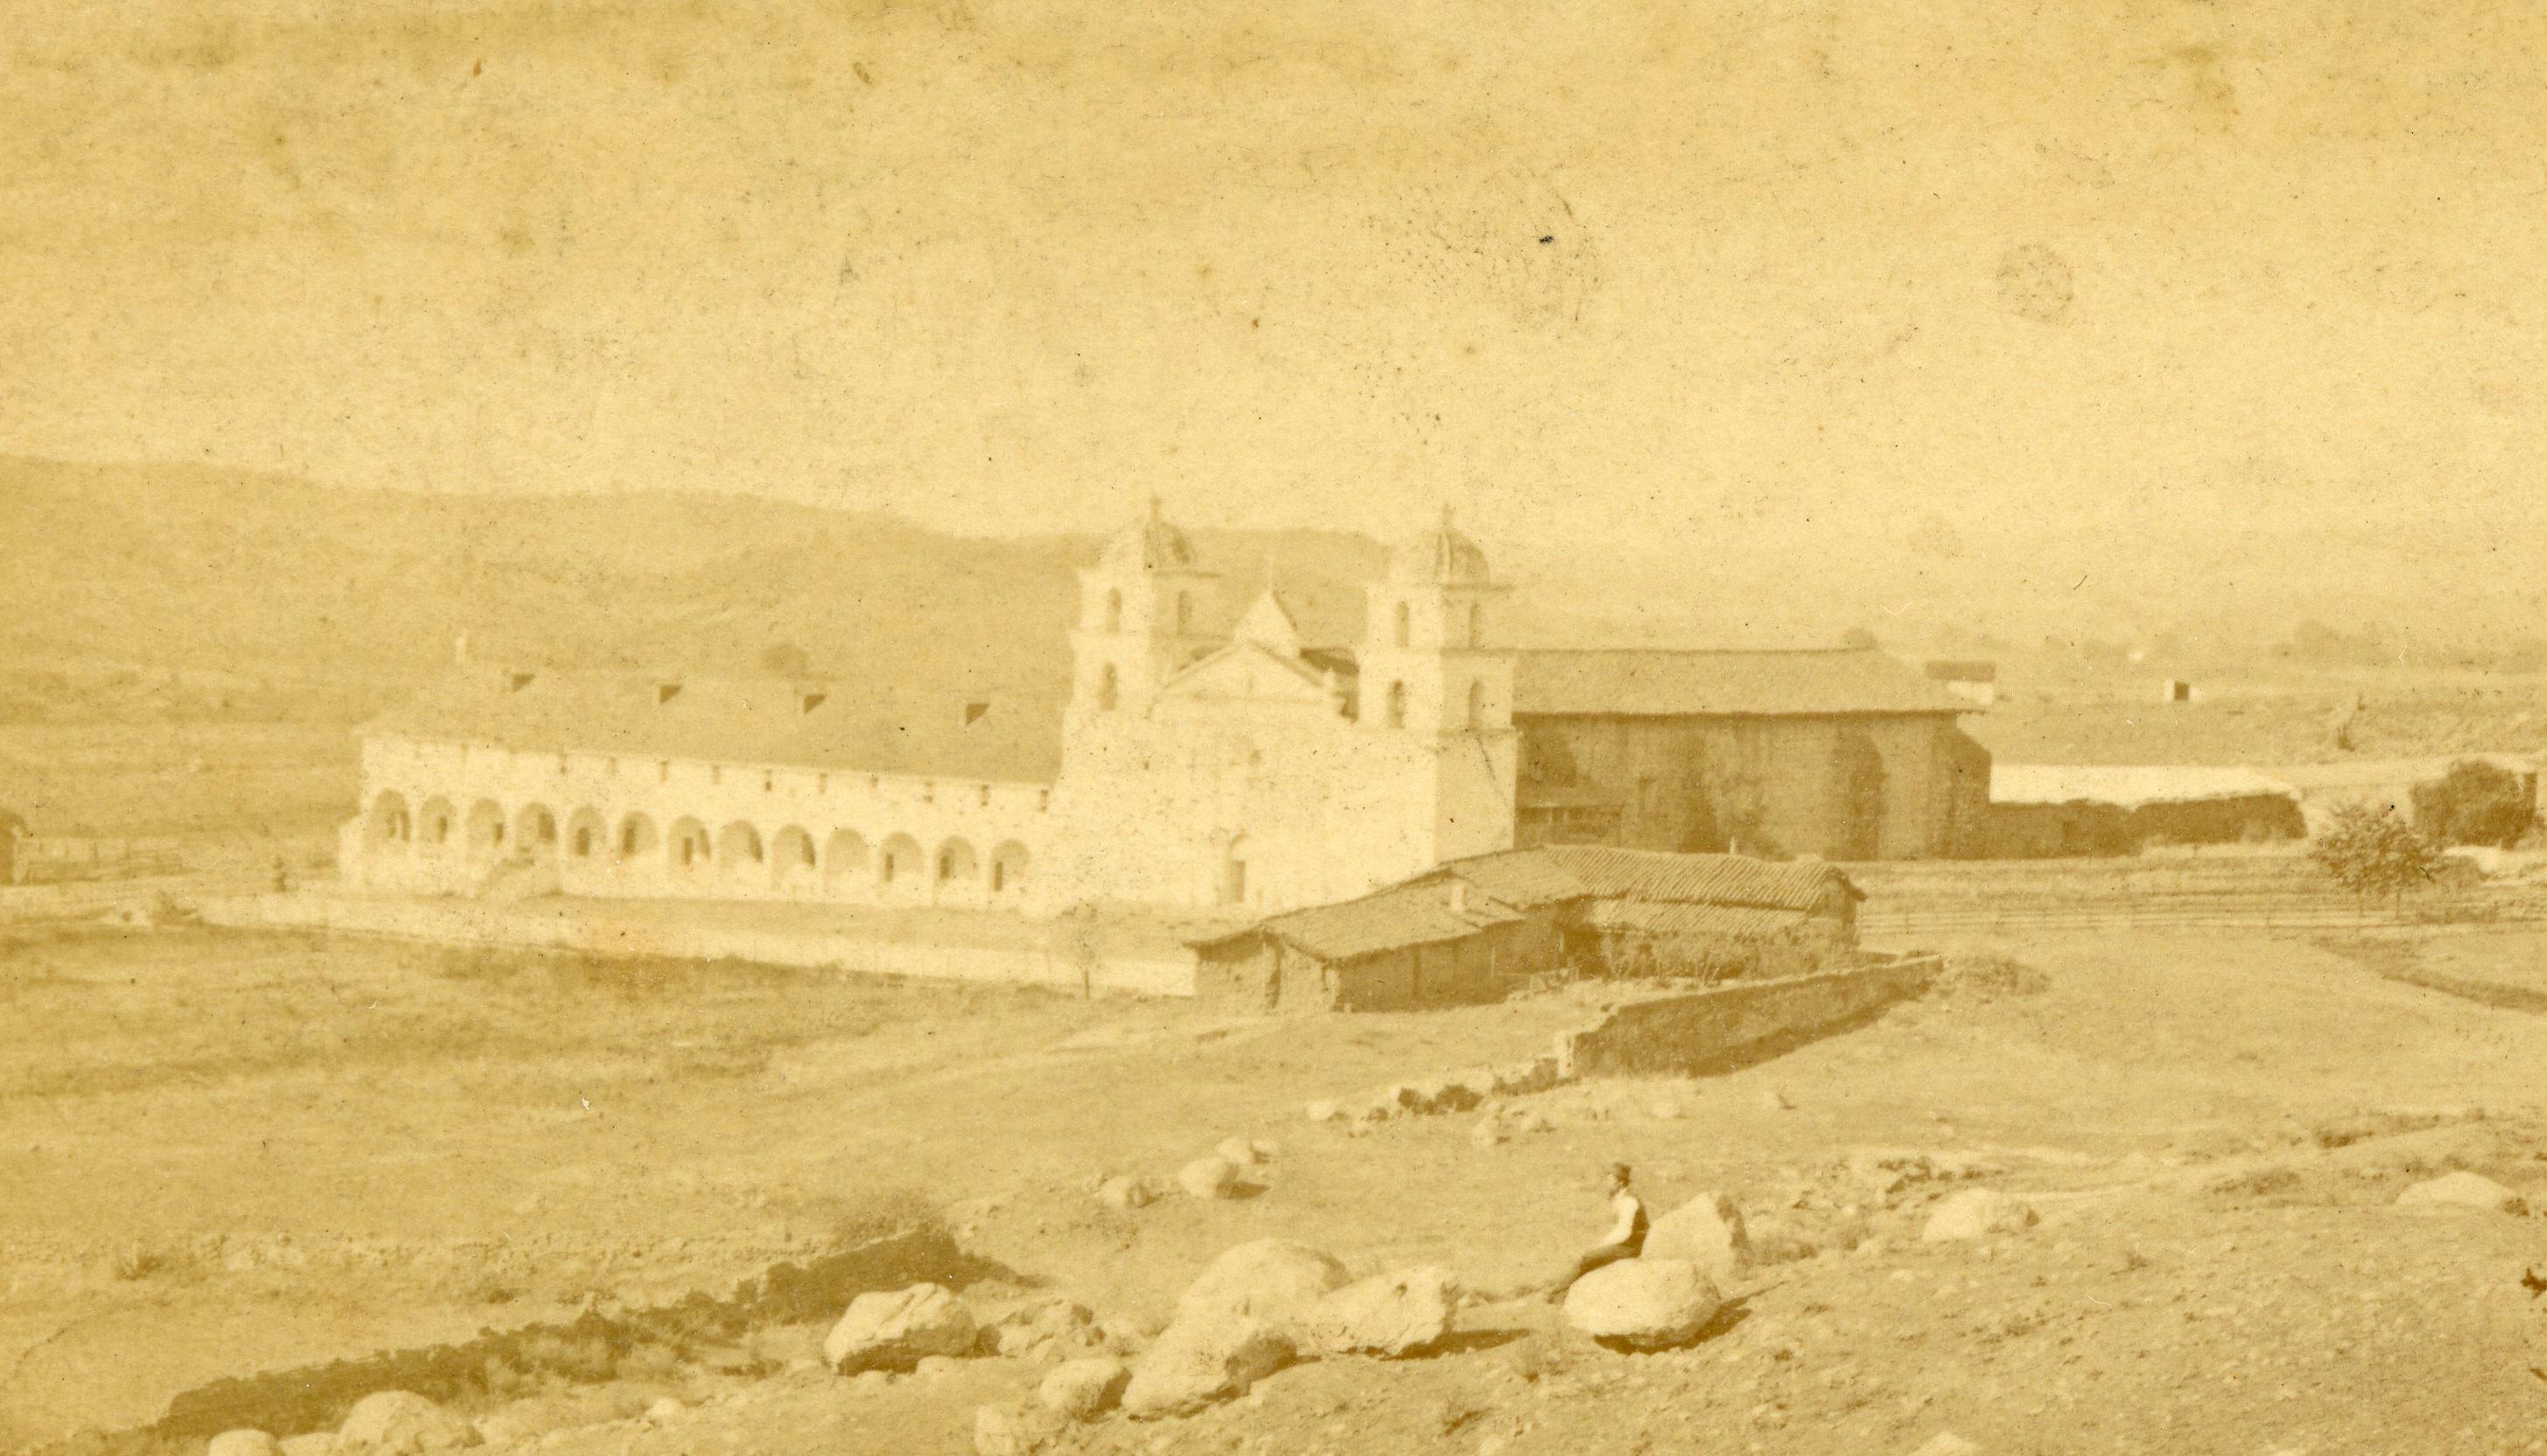 Talk: Earliest Photos of Santa Barbara